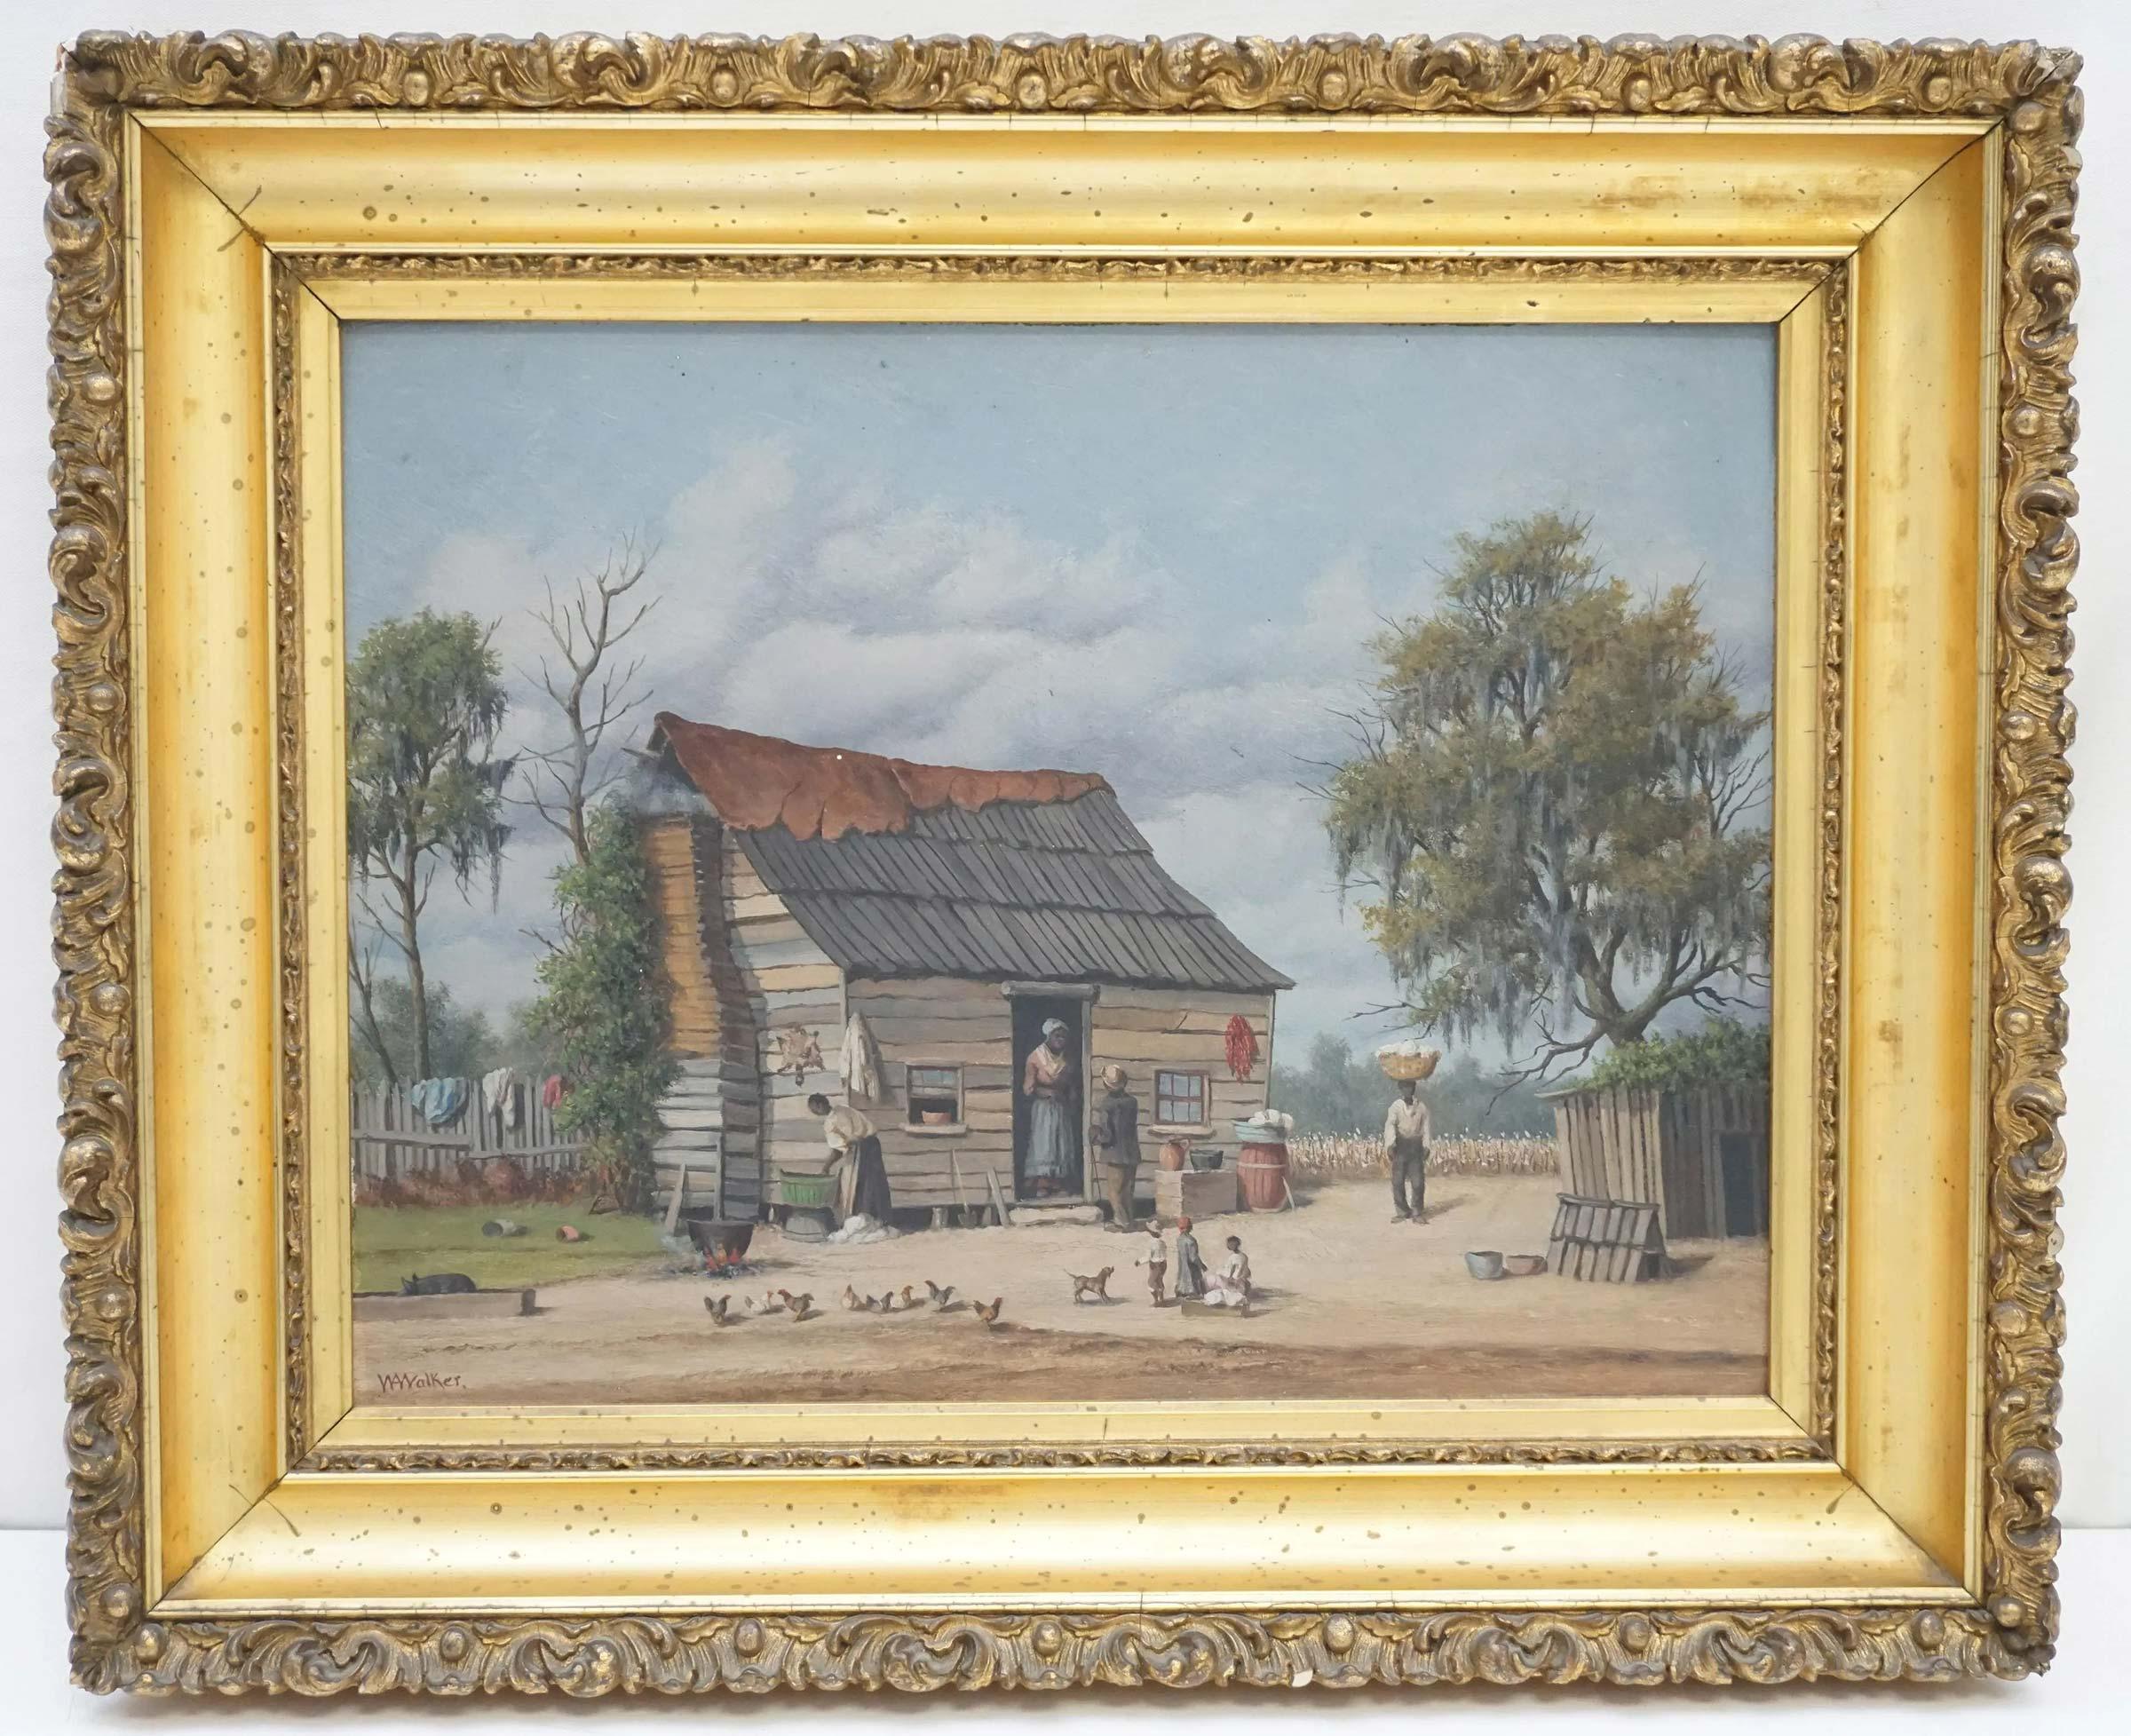 William Aiken Walker (1838-1921) Busy South Carolina Cabin Scene, $11,000-$14,000.